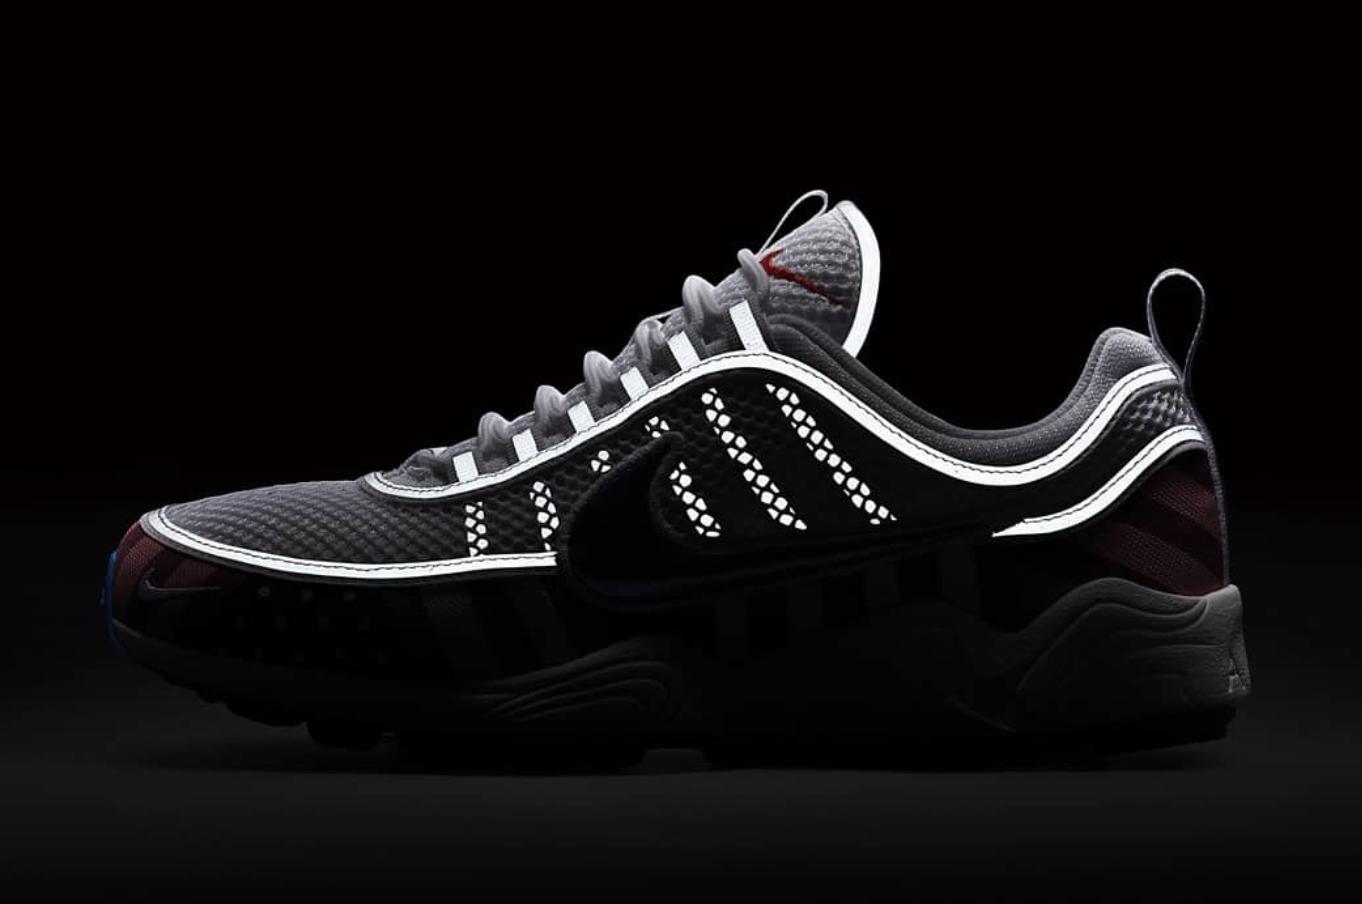 cc31b0f2ffb7 Parra x Nike Zoom Spiridon White Multi